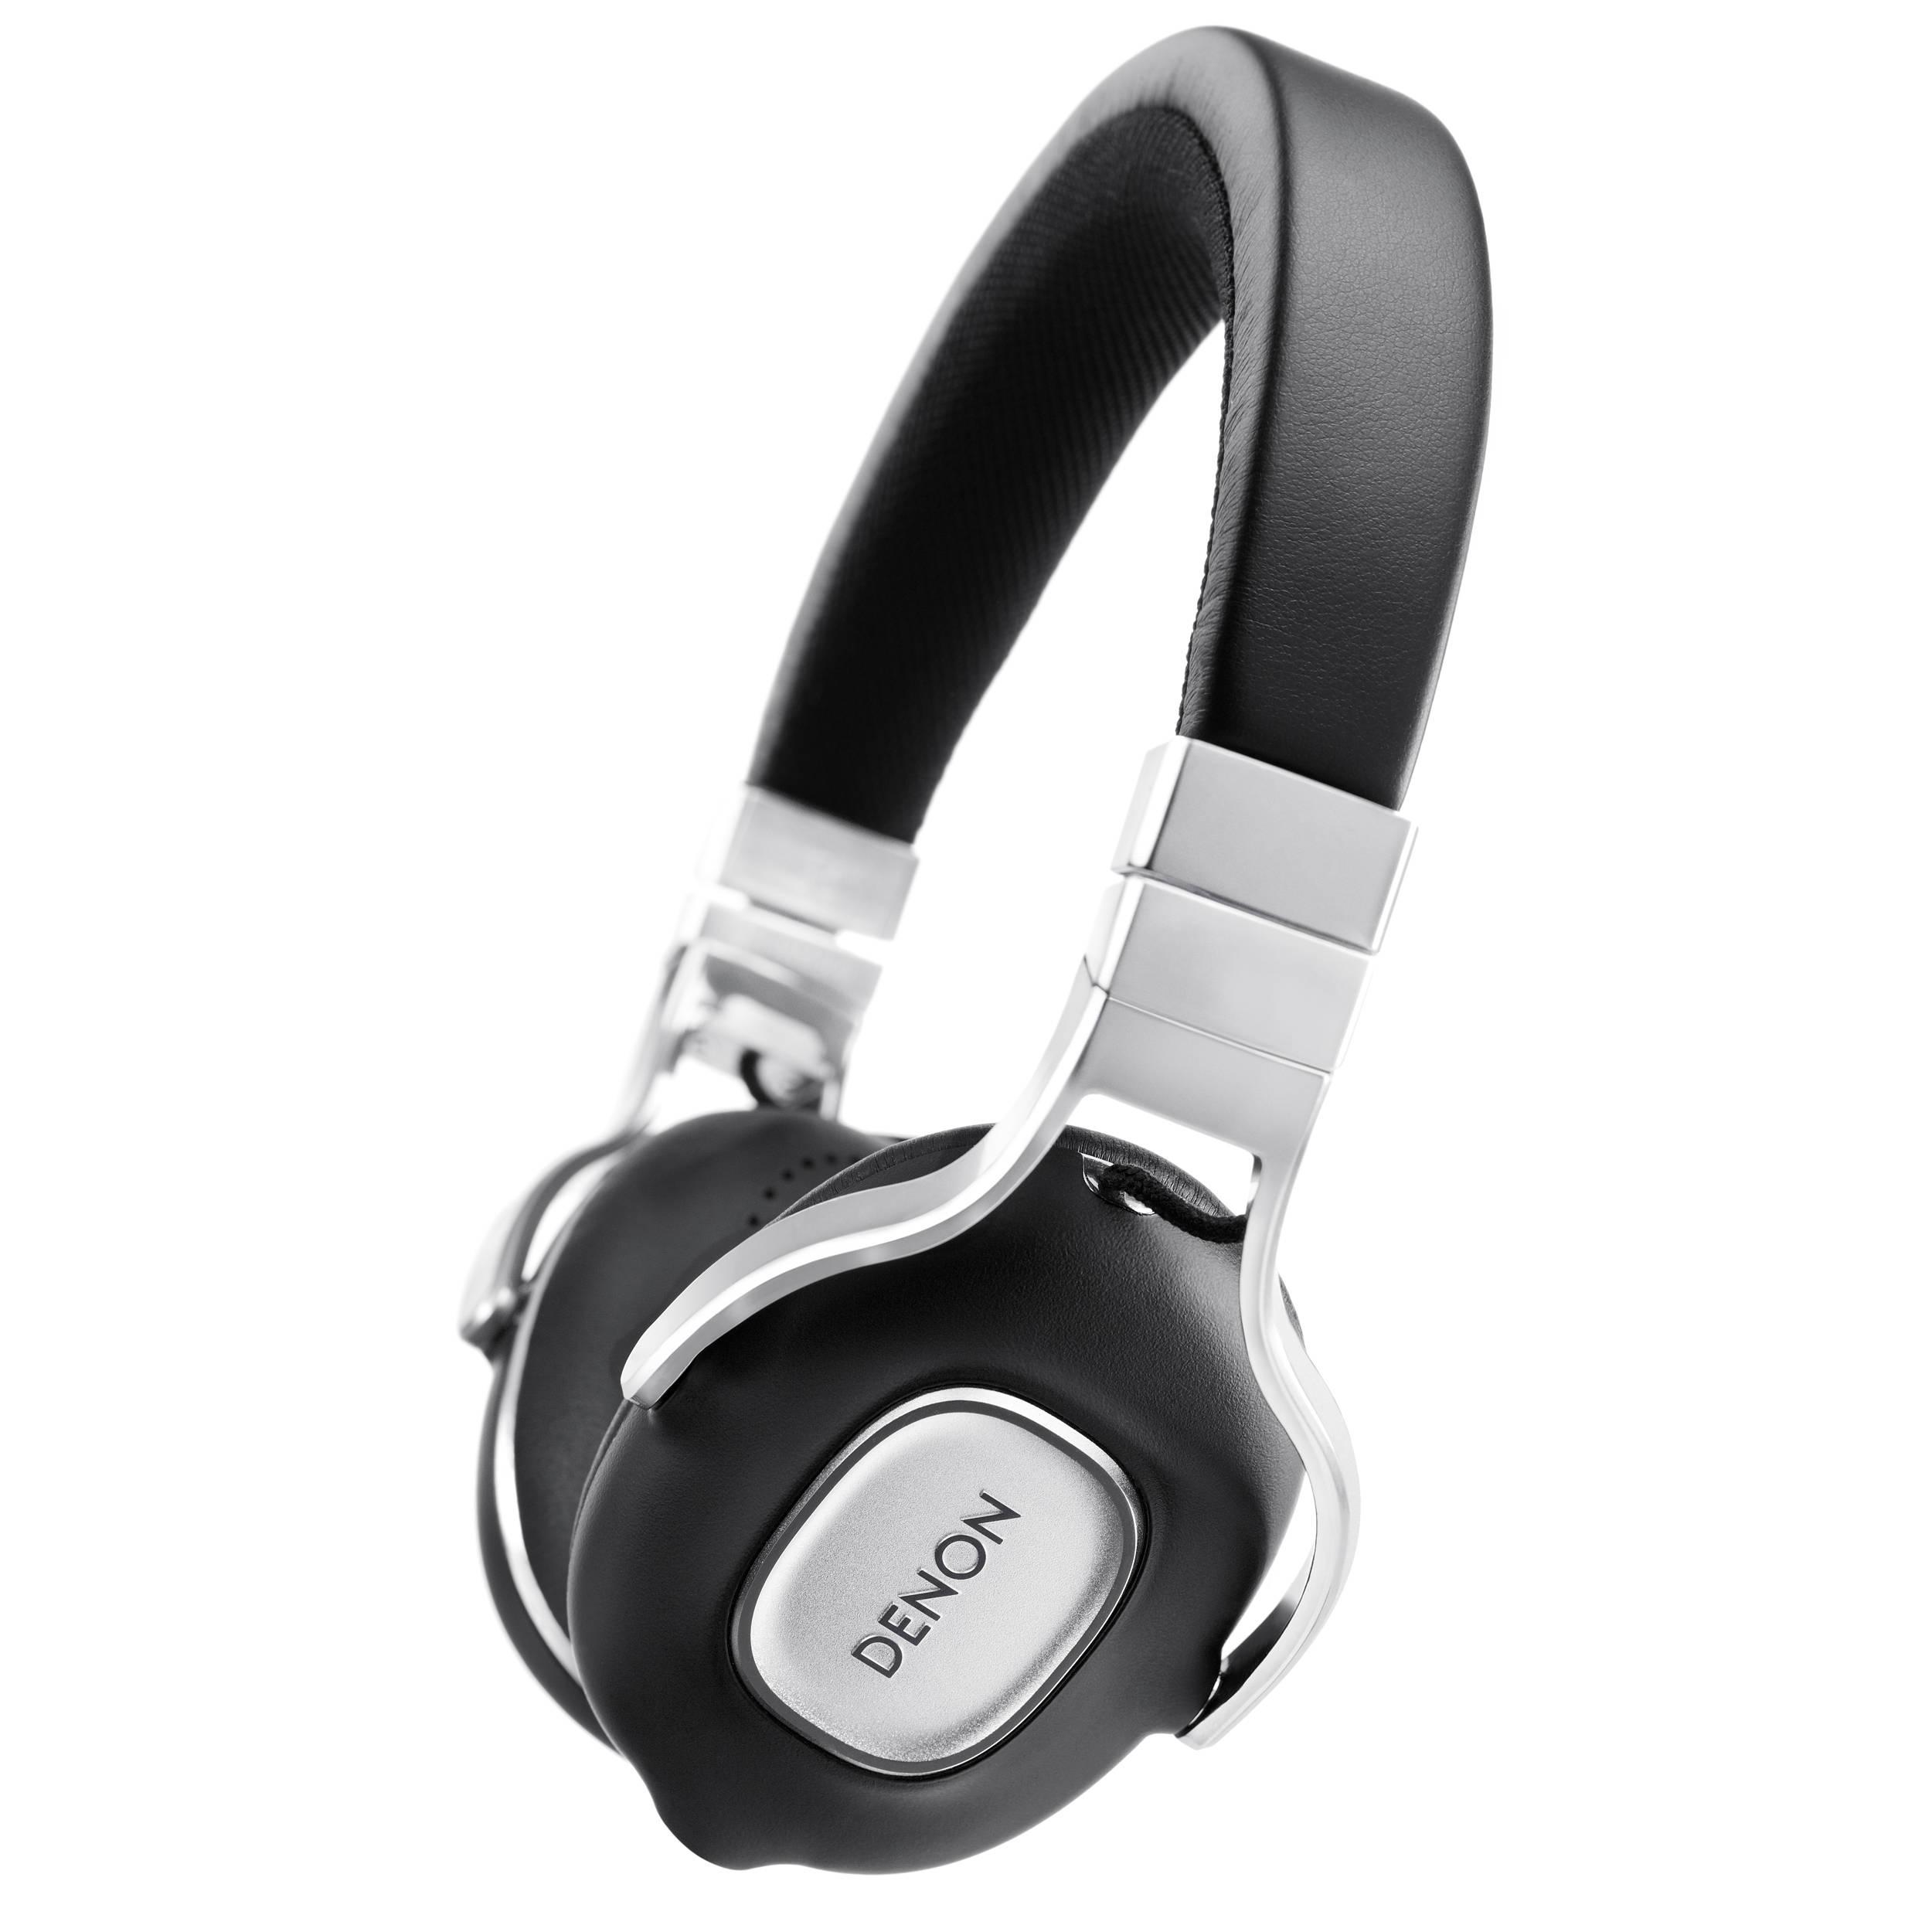 Denon AH-MM300 On-Ear Headphones AHMM300 B&H Photo Video